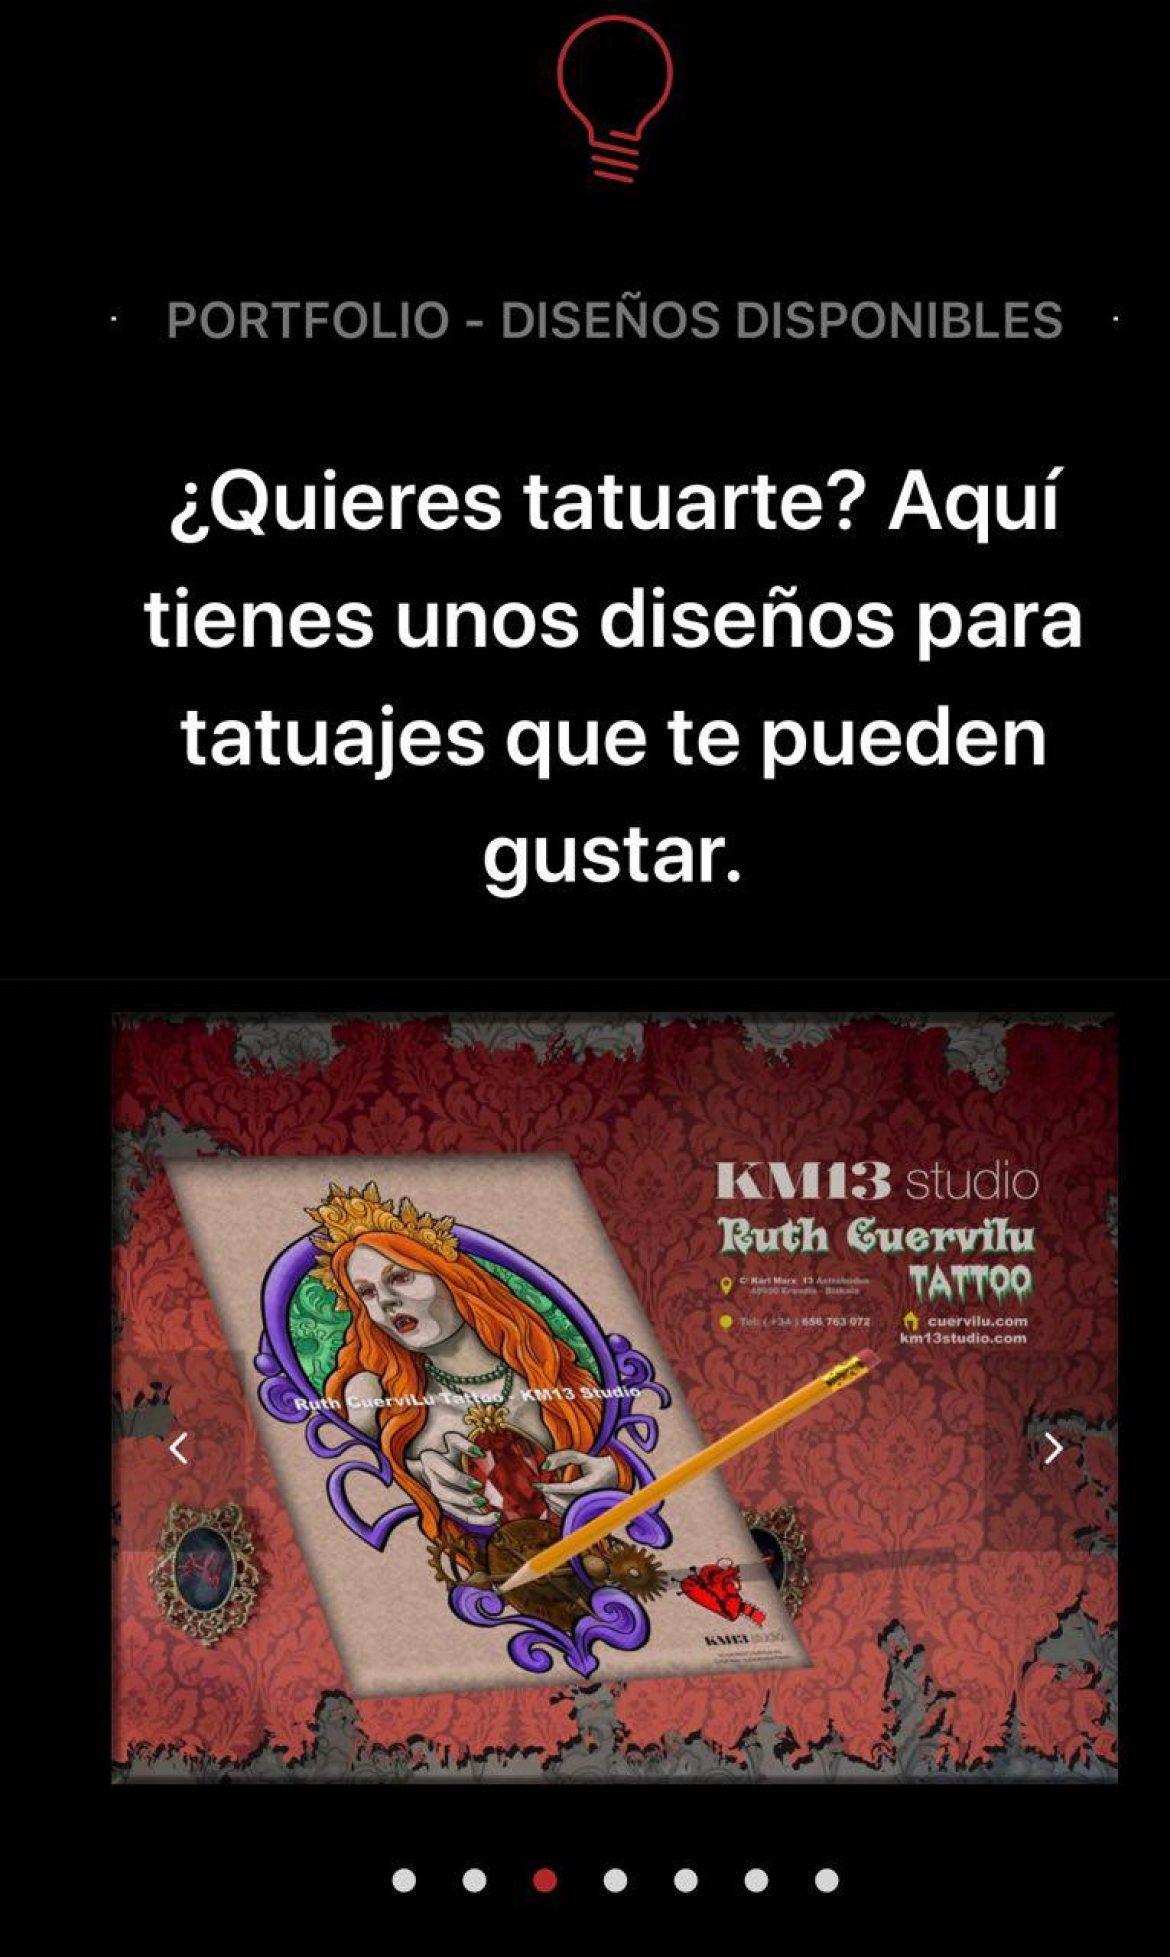 tatuajes-diseños-disponible-Ruth-Cuervilu-Tattoo-KM13-Studio.-Astrabudua-Erandio-Bizkaia